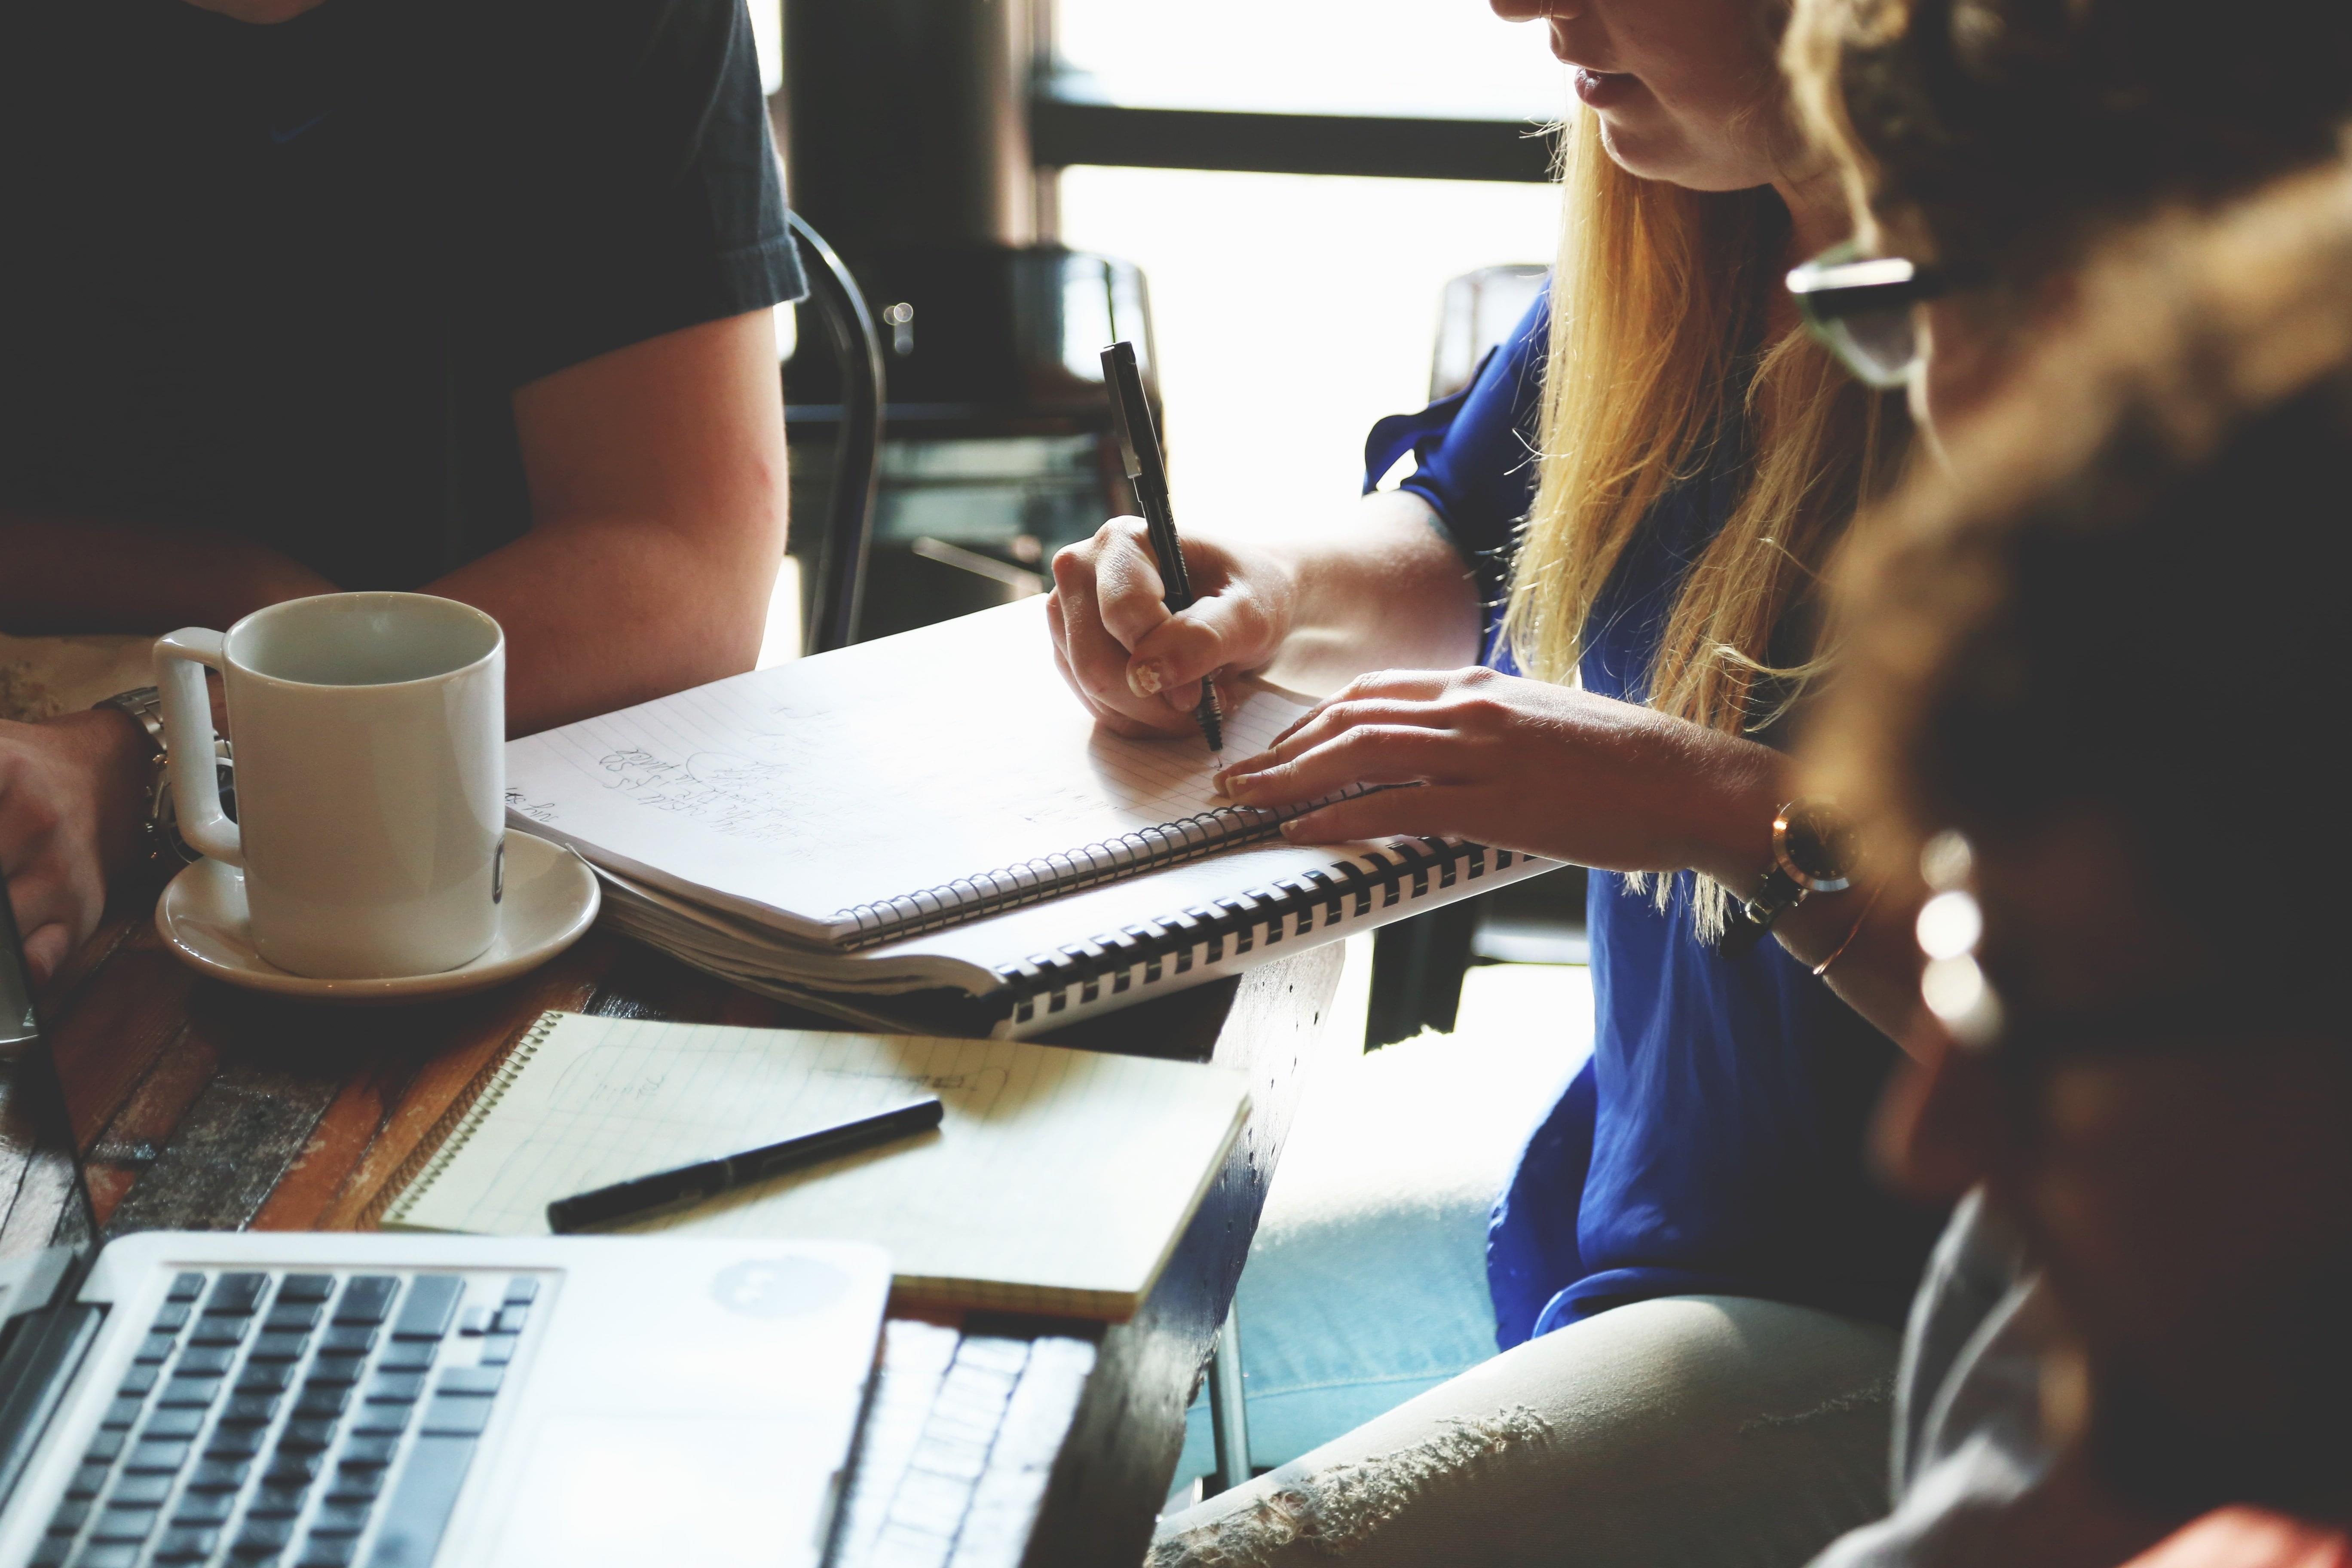 70f8f2d89d8 3 Interview Questions You Should Ask That Will Predict Job Performance